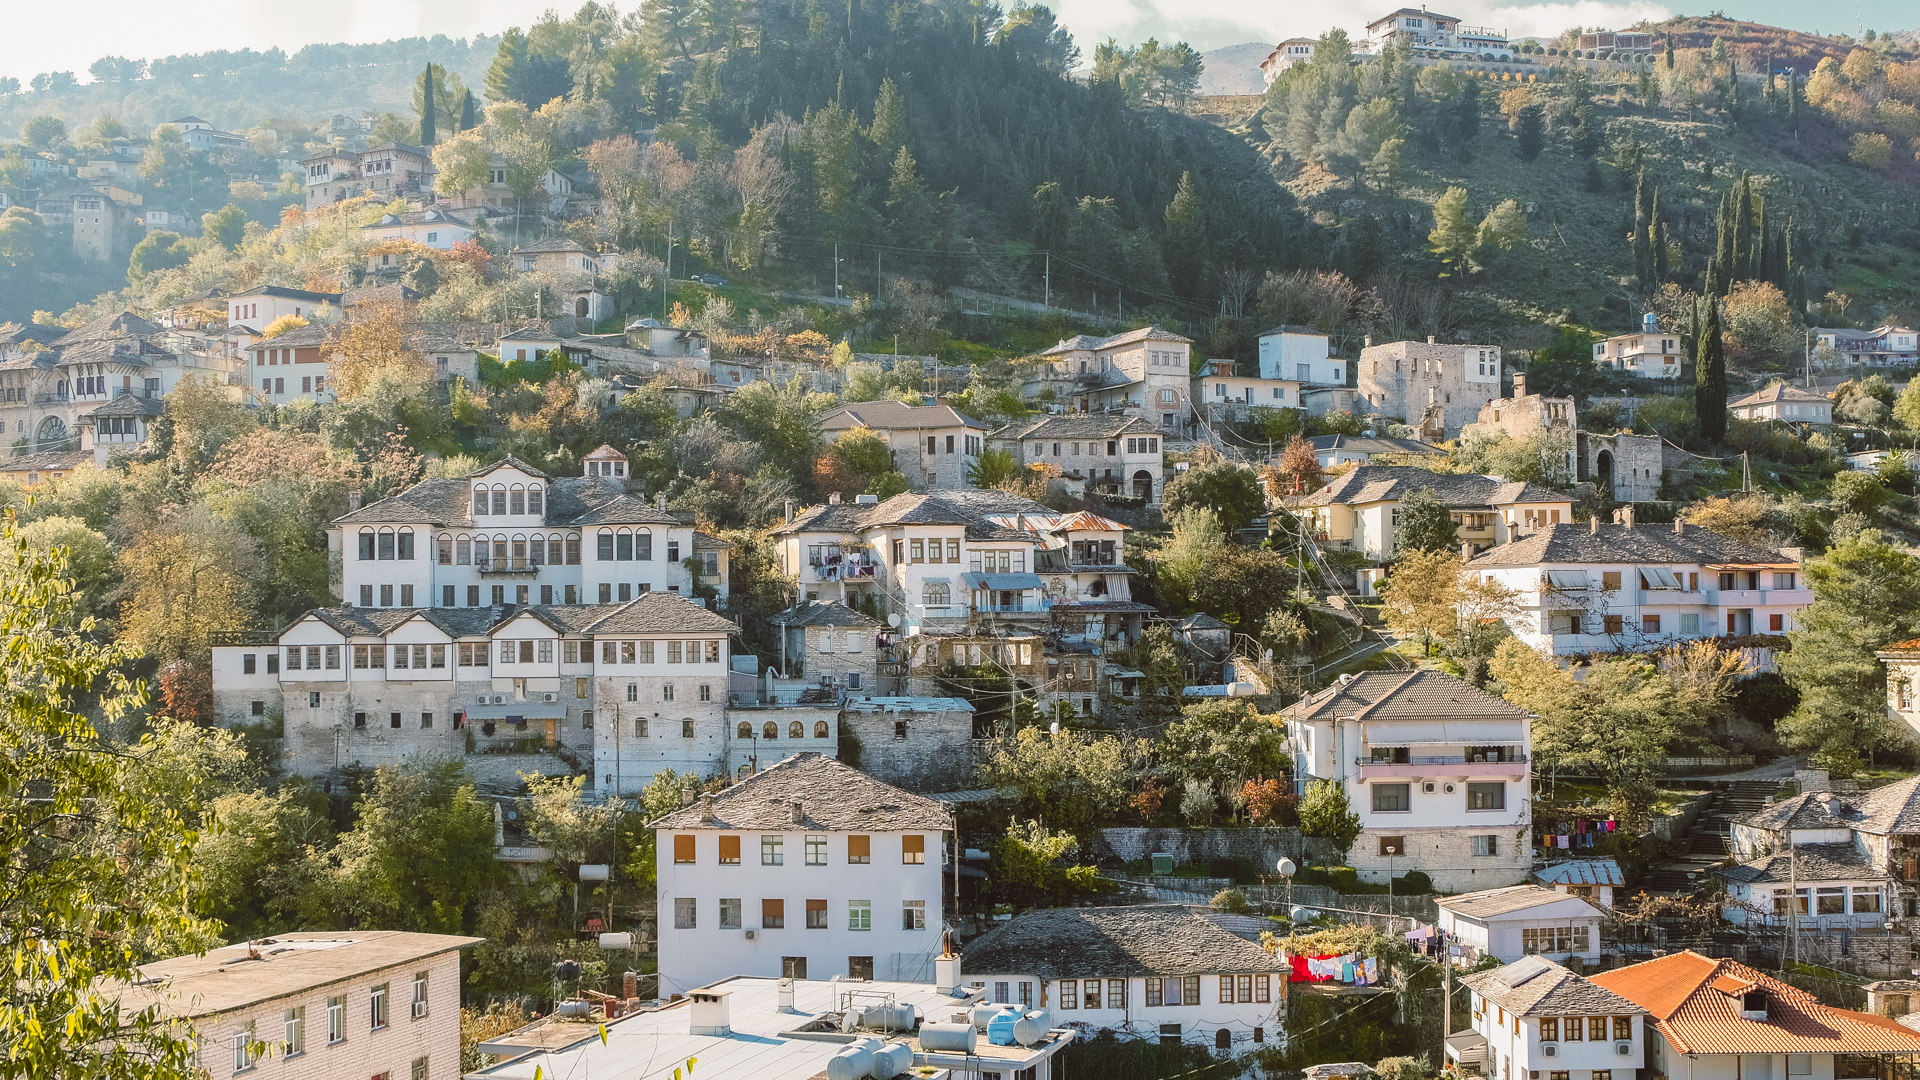 Gjirokastër Historic Centre UNESCO World Heritage Site